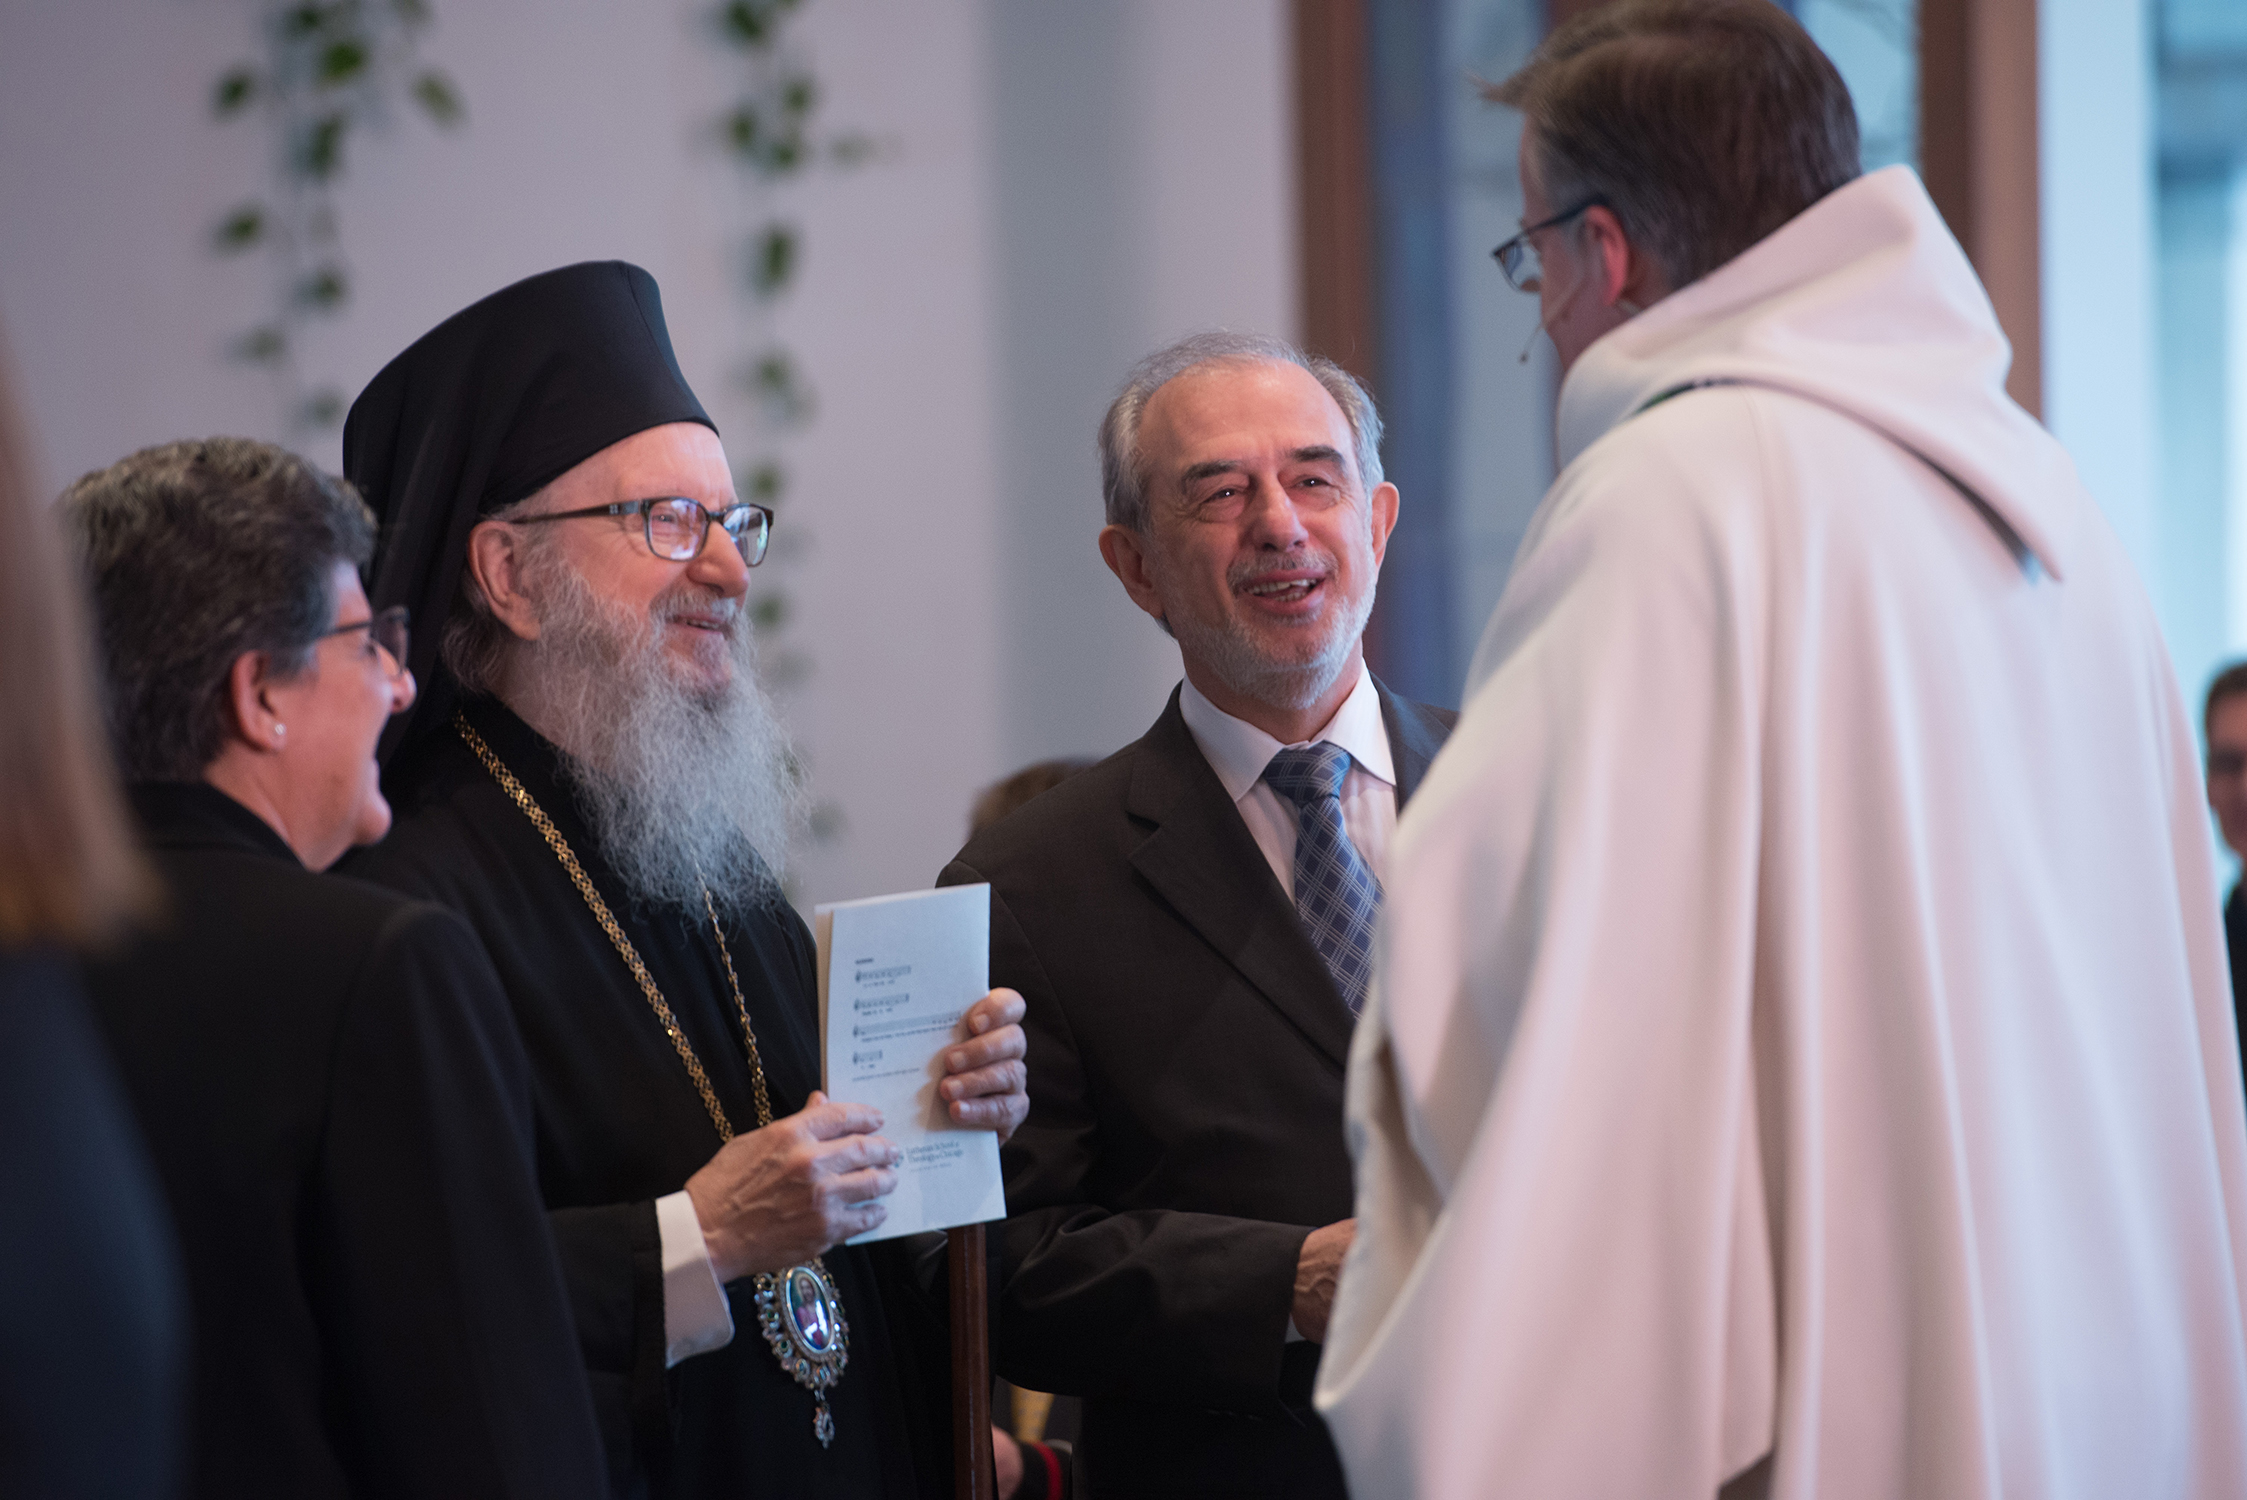 Archbishop-President-2-LSTCRareNT096.jpg